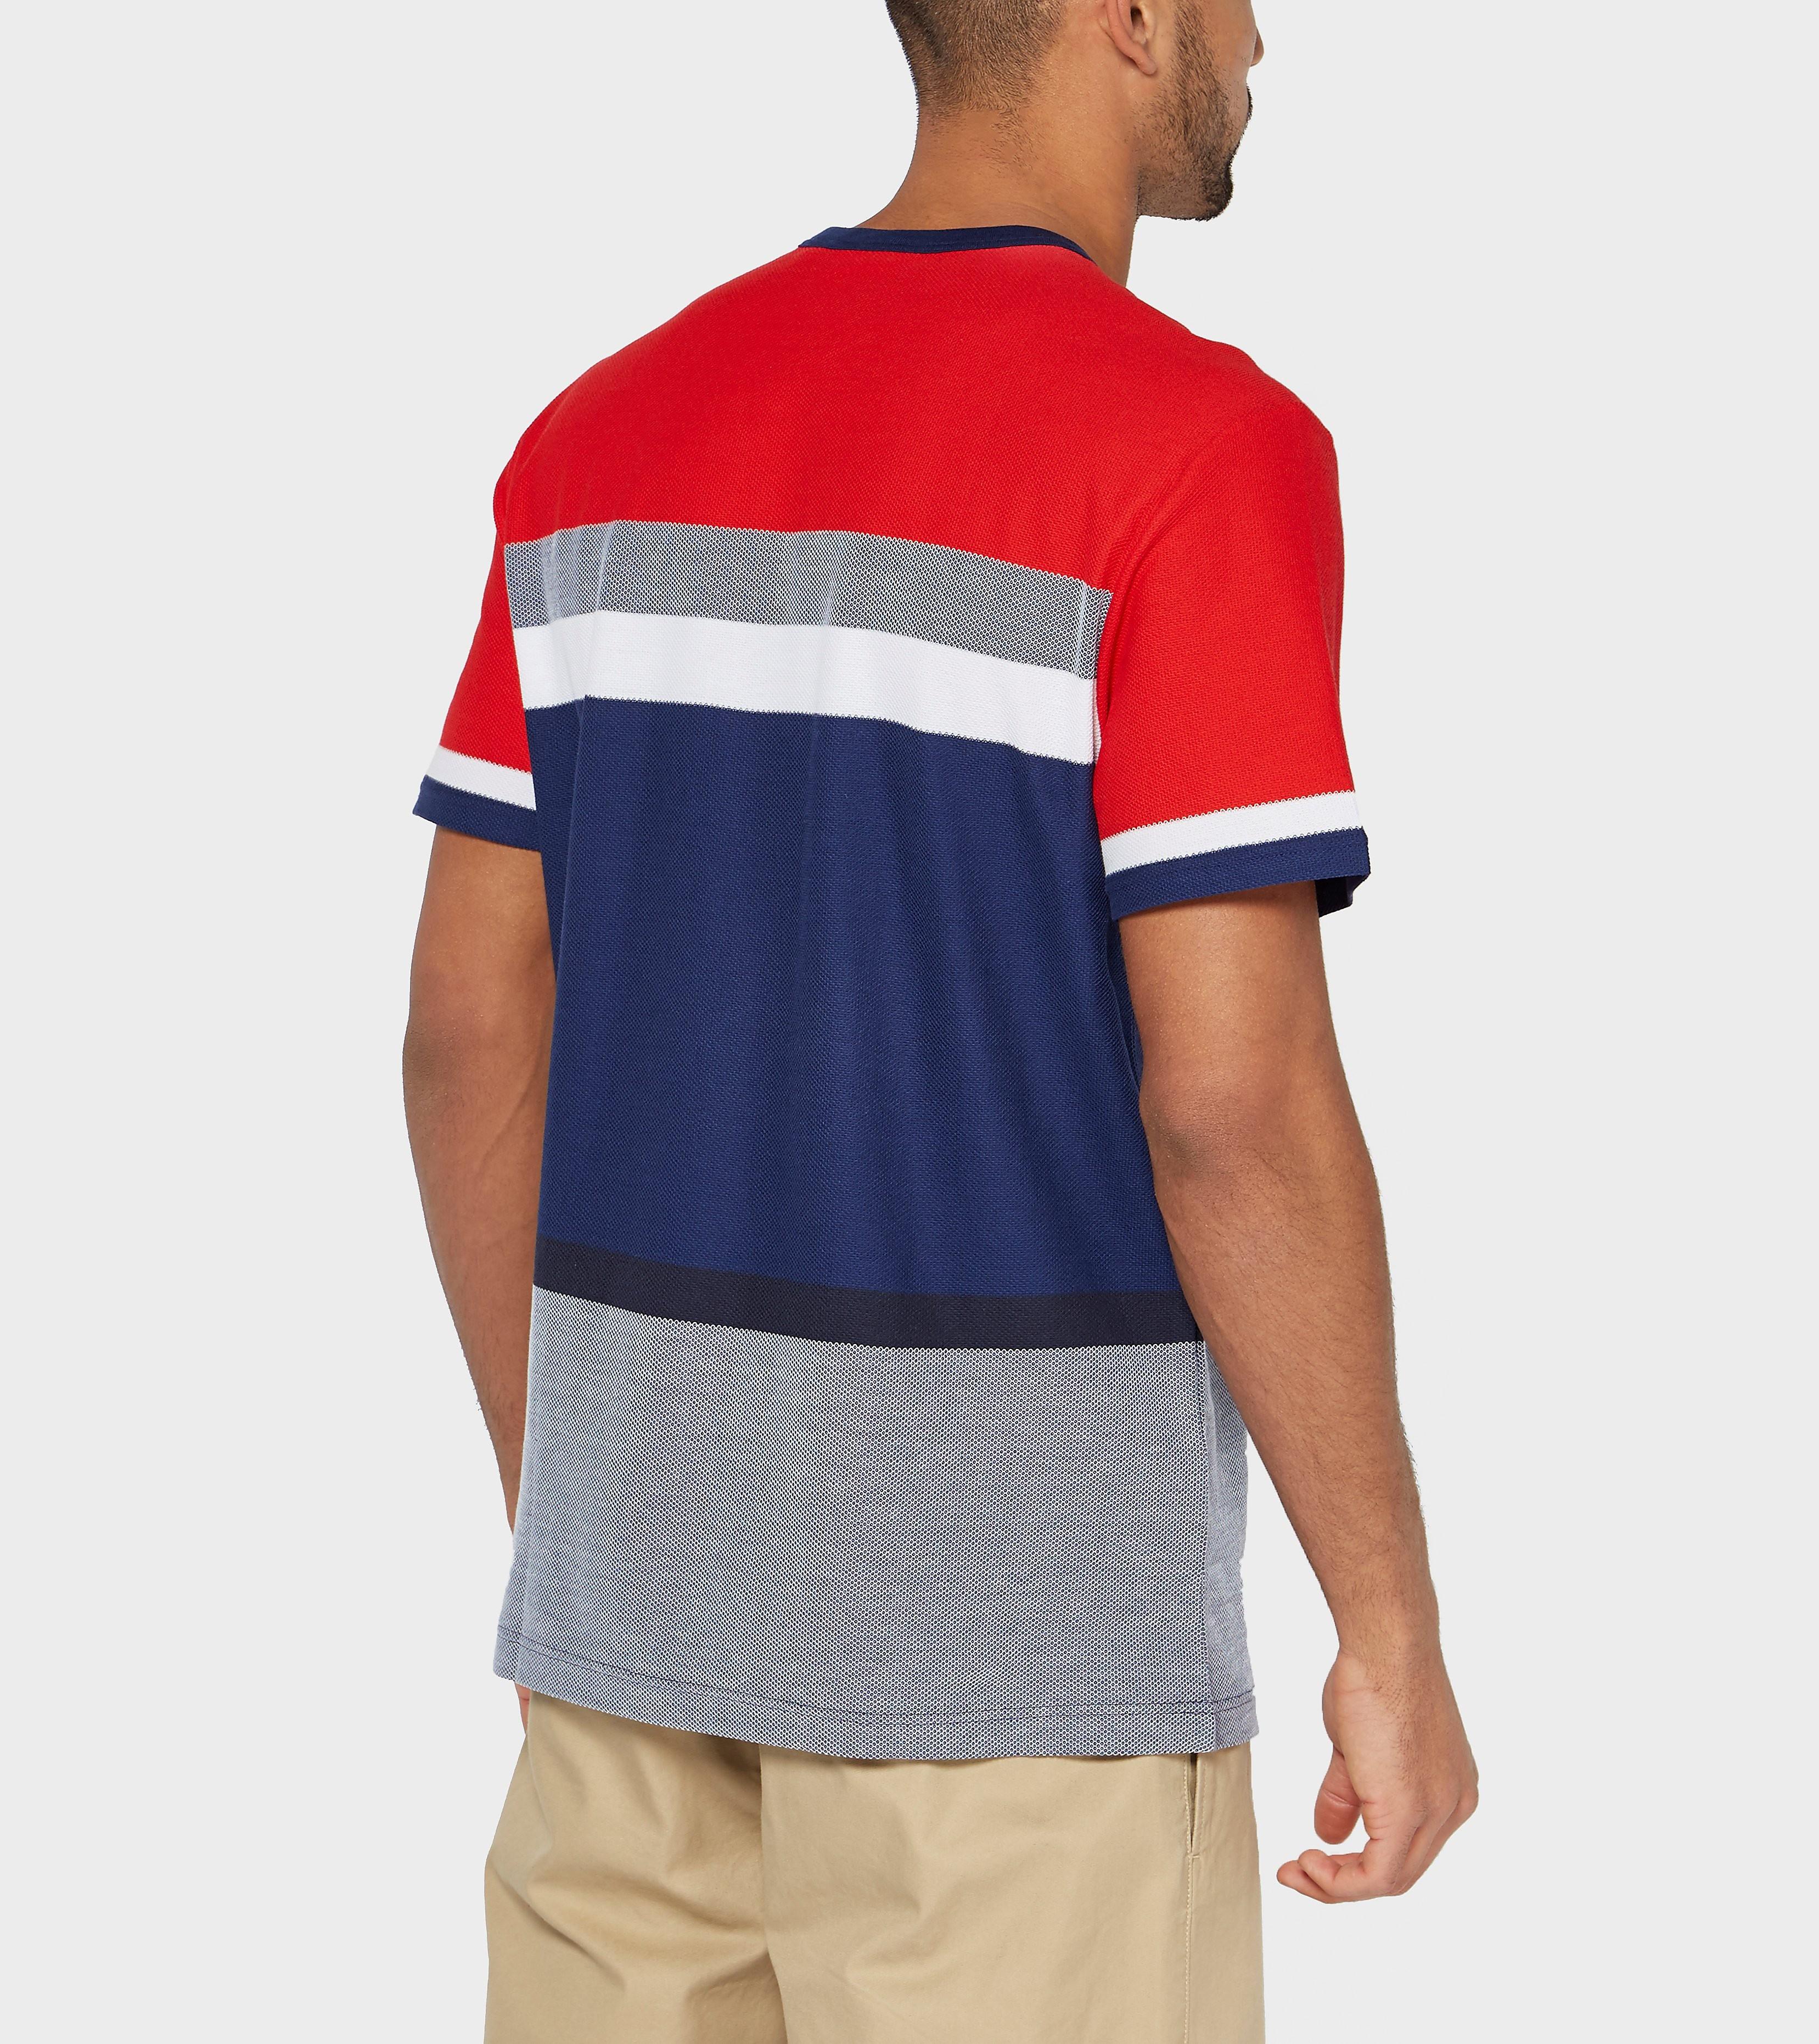 Lacoste Pique Collar T-Shirt